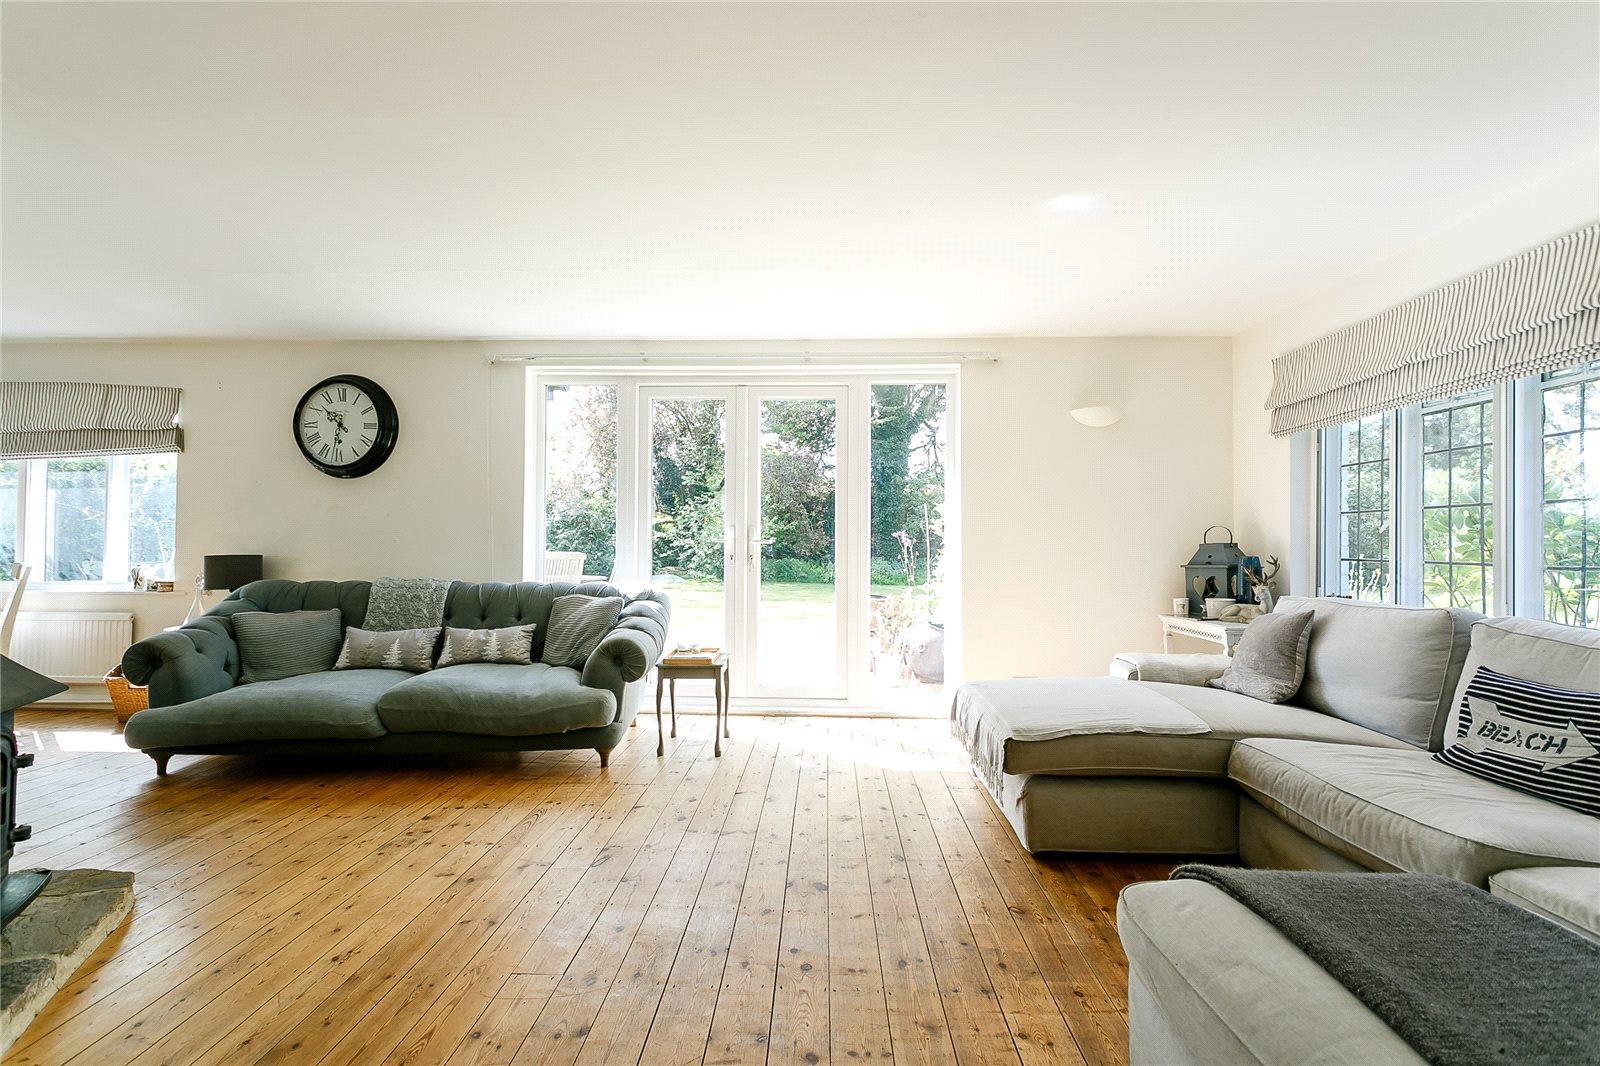 Additional photo for property listing at Westlands Estate, Birdham, Chichester, West Sussex, PO20 Chichester, Inglaterra